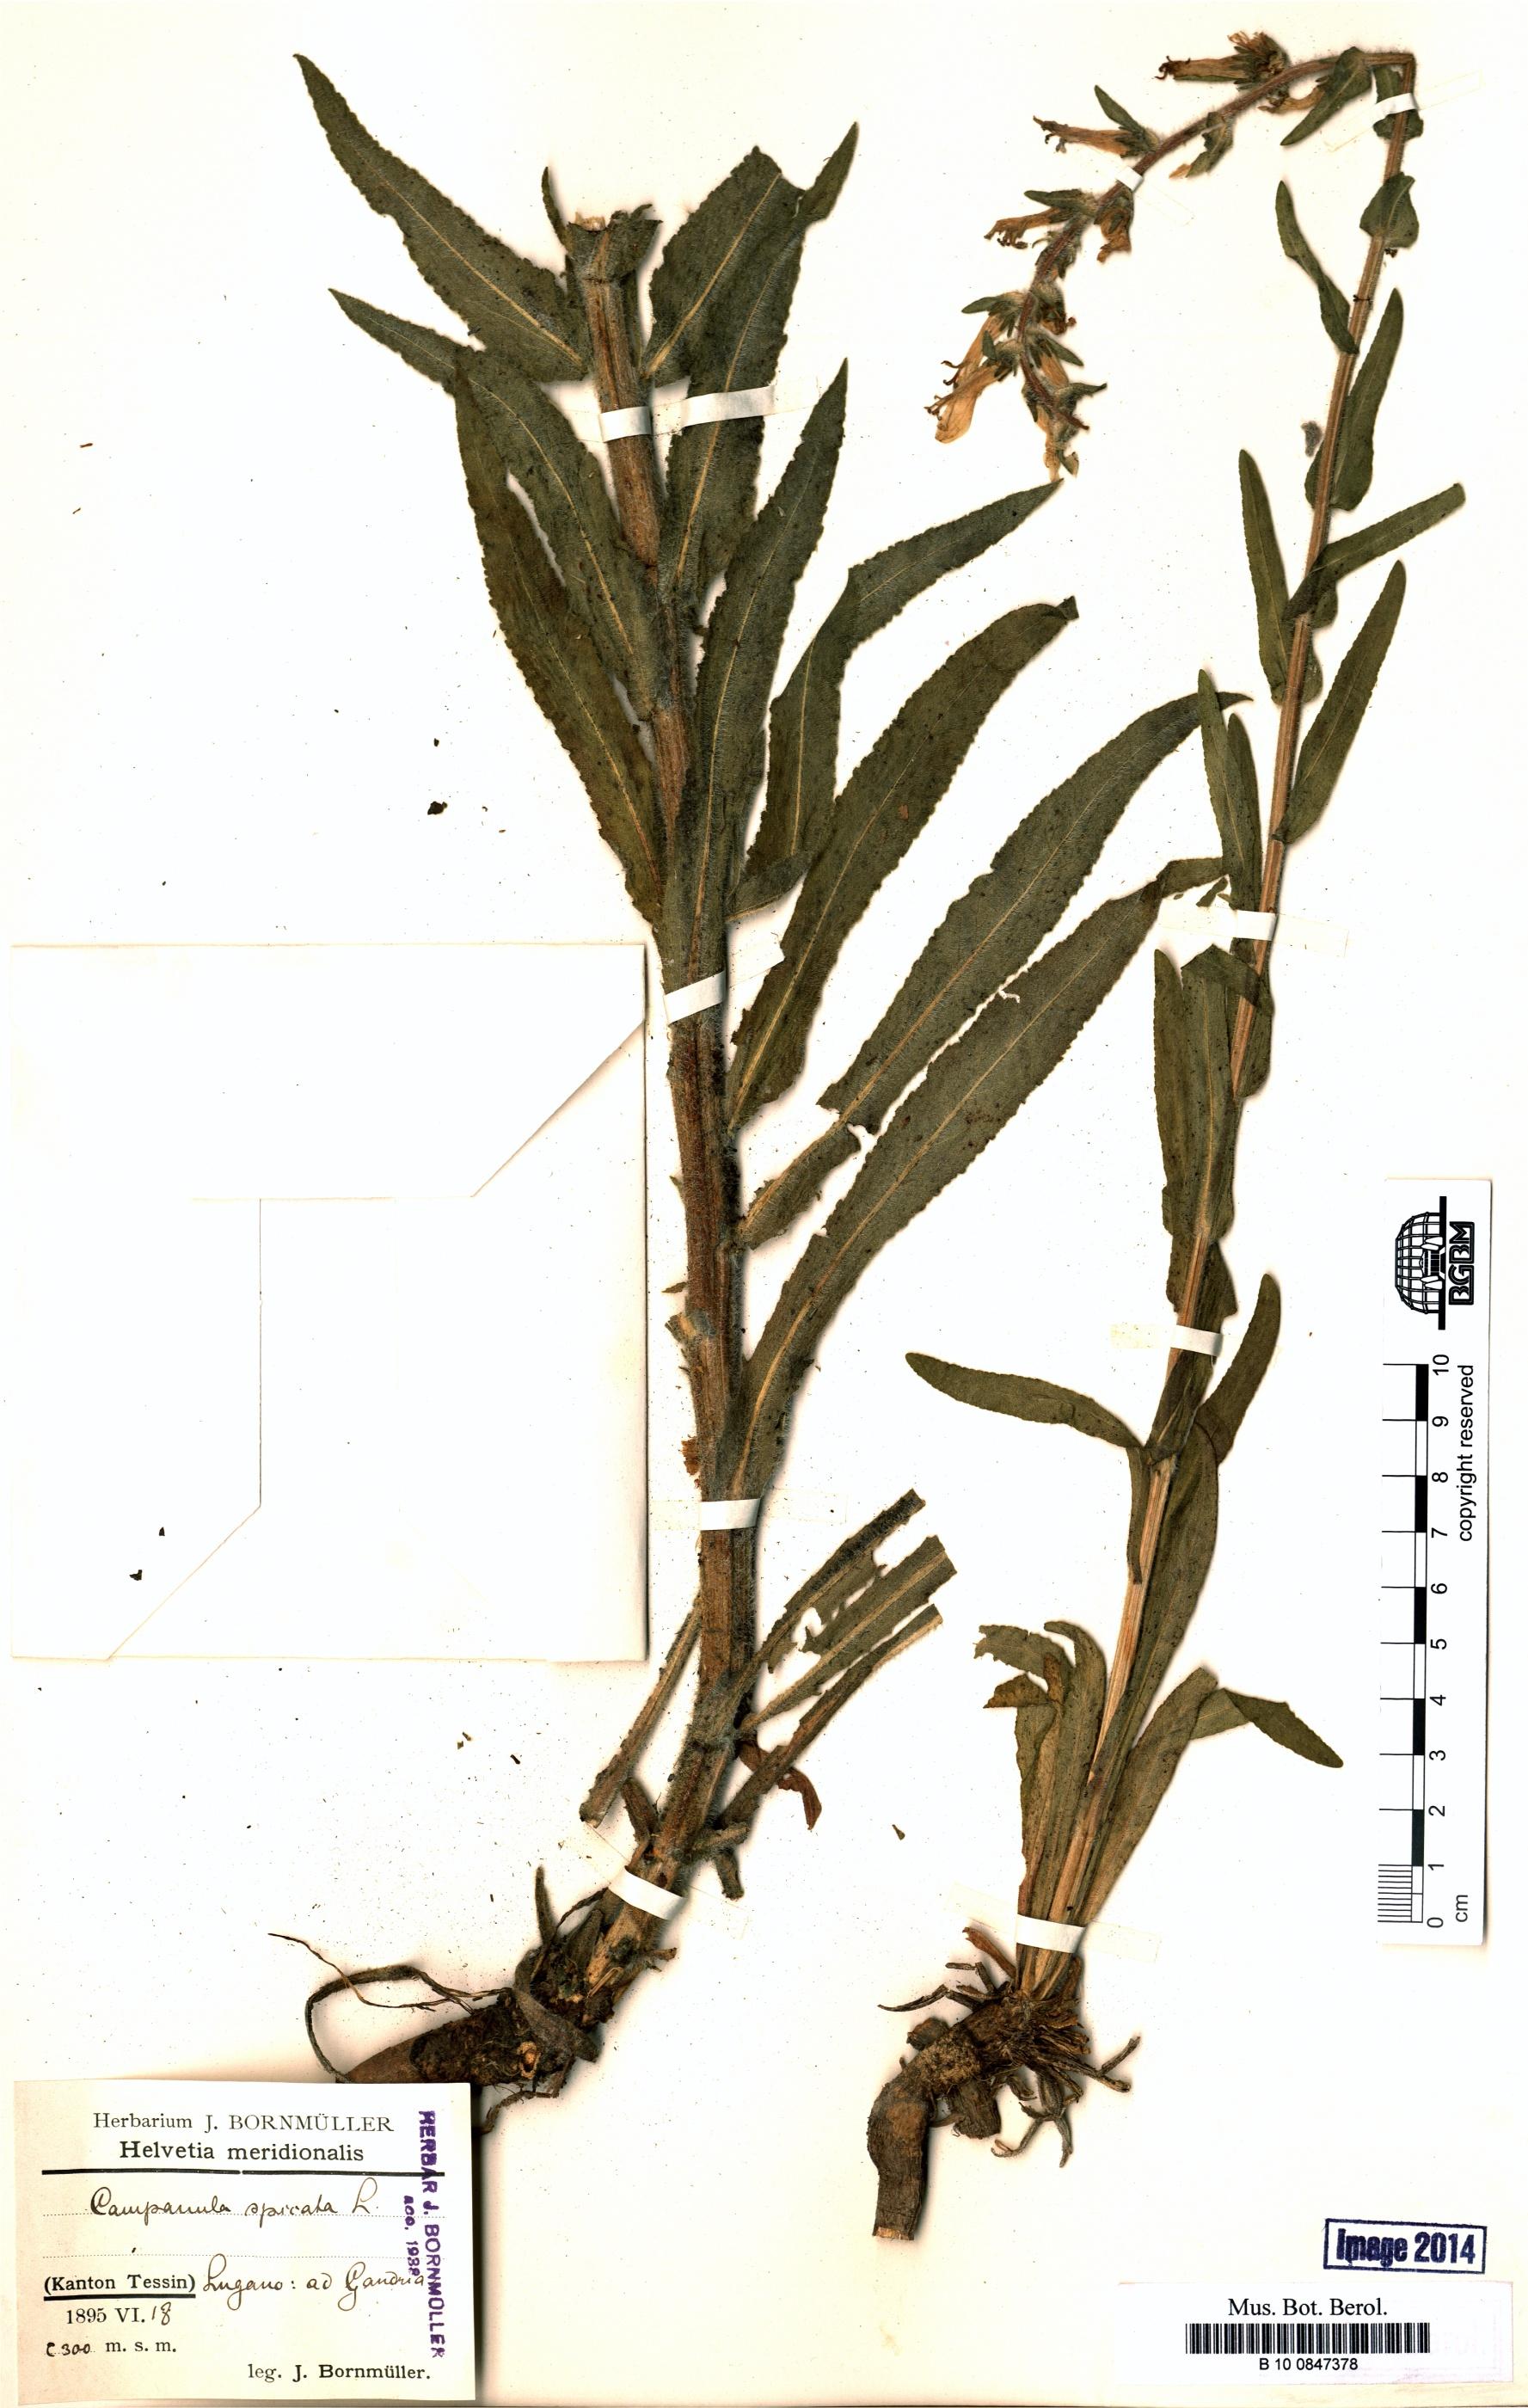 http://ww2.bgbm.org/herbarium/images/B/10/08/47/37/B_10_0847378.jpg